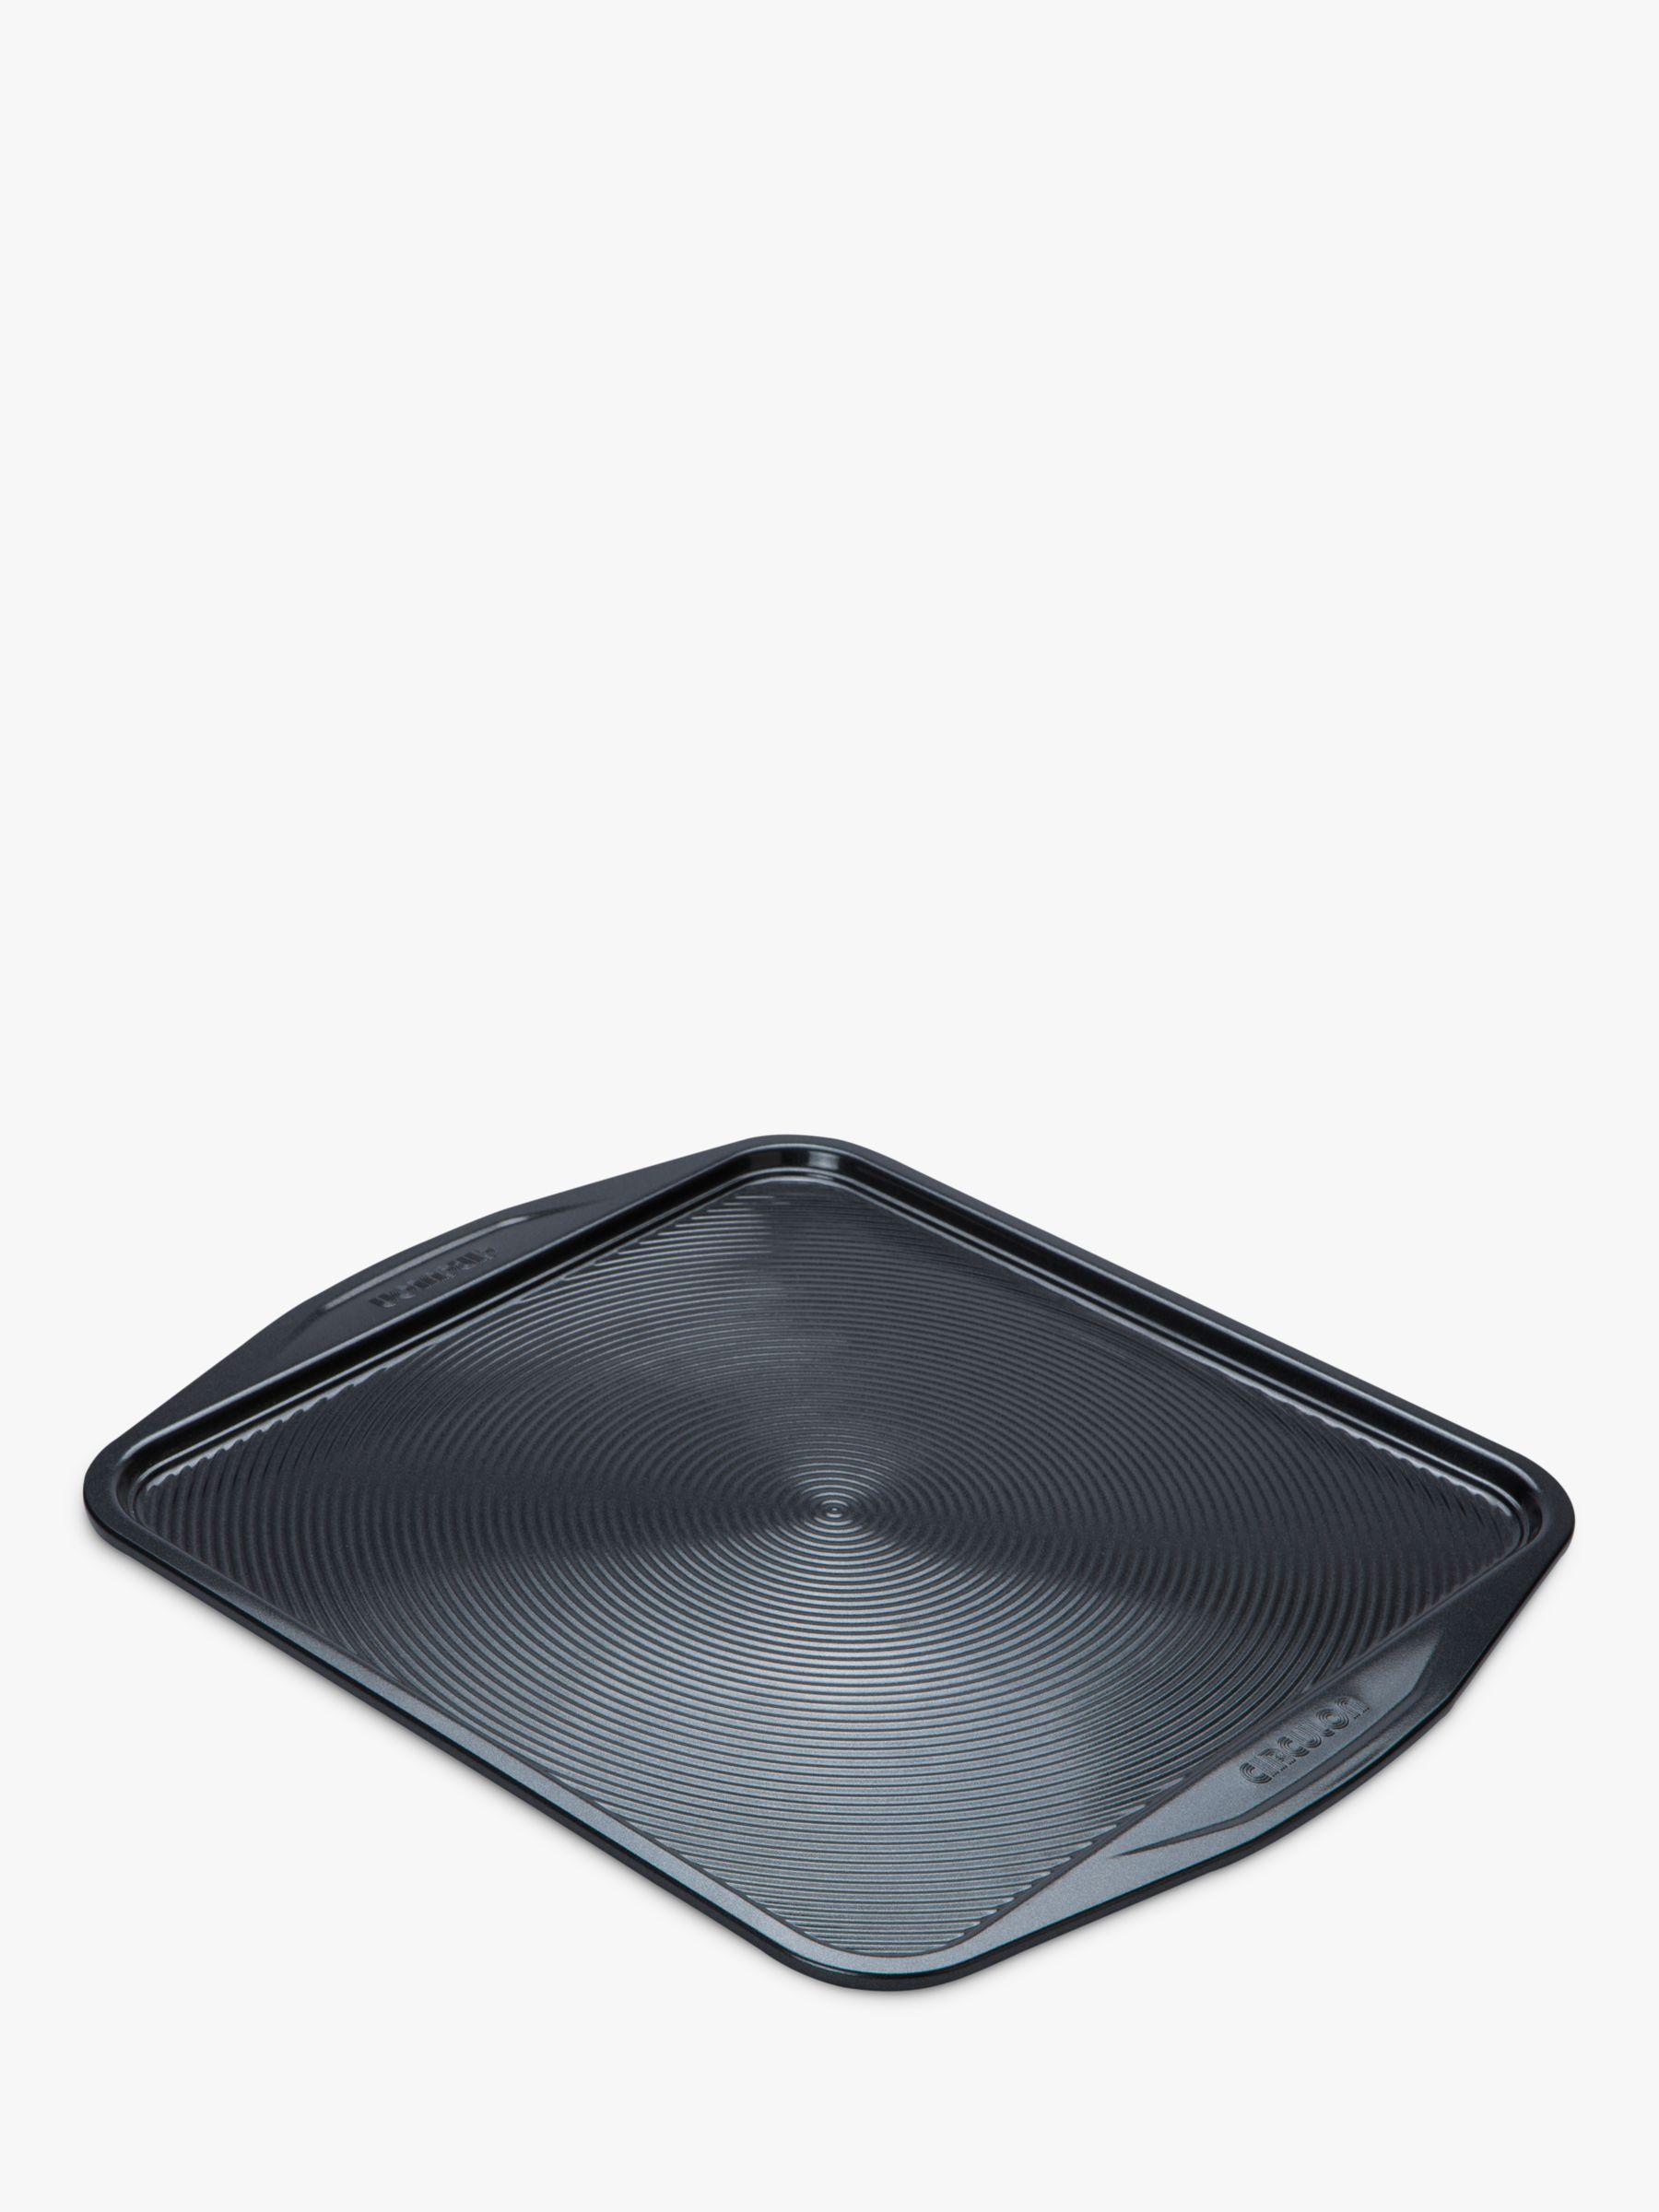 Circulon Ultimum Carbon Steel Non-Stick Square Baking Tray, 29cm